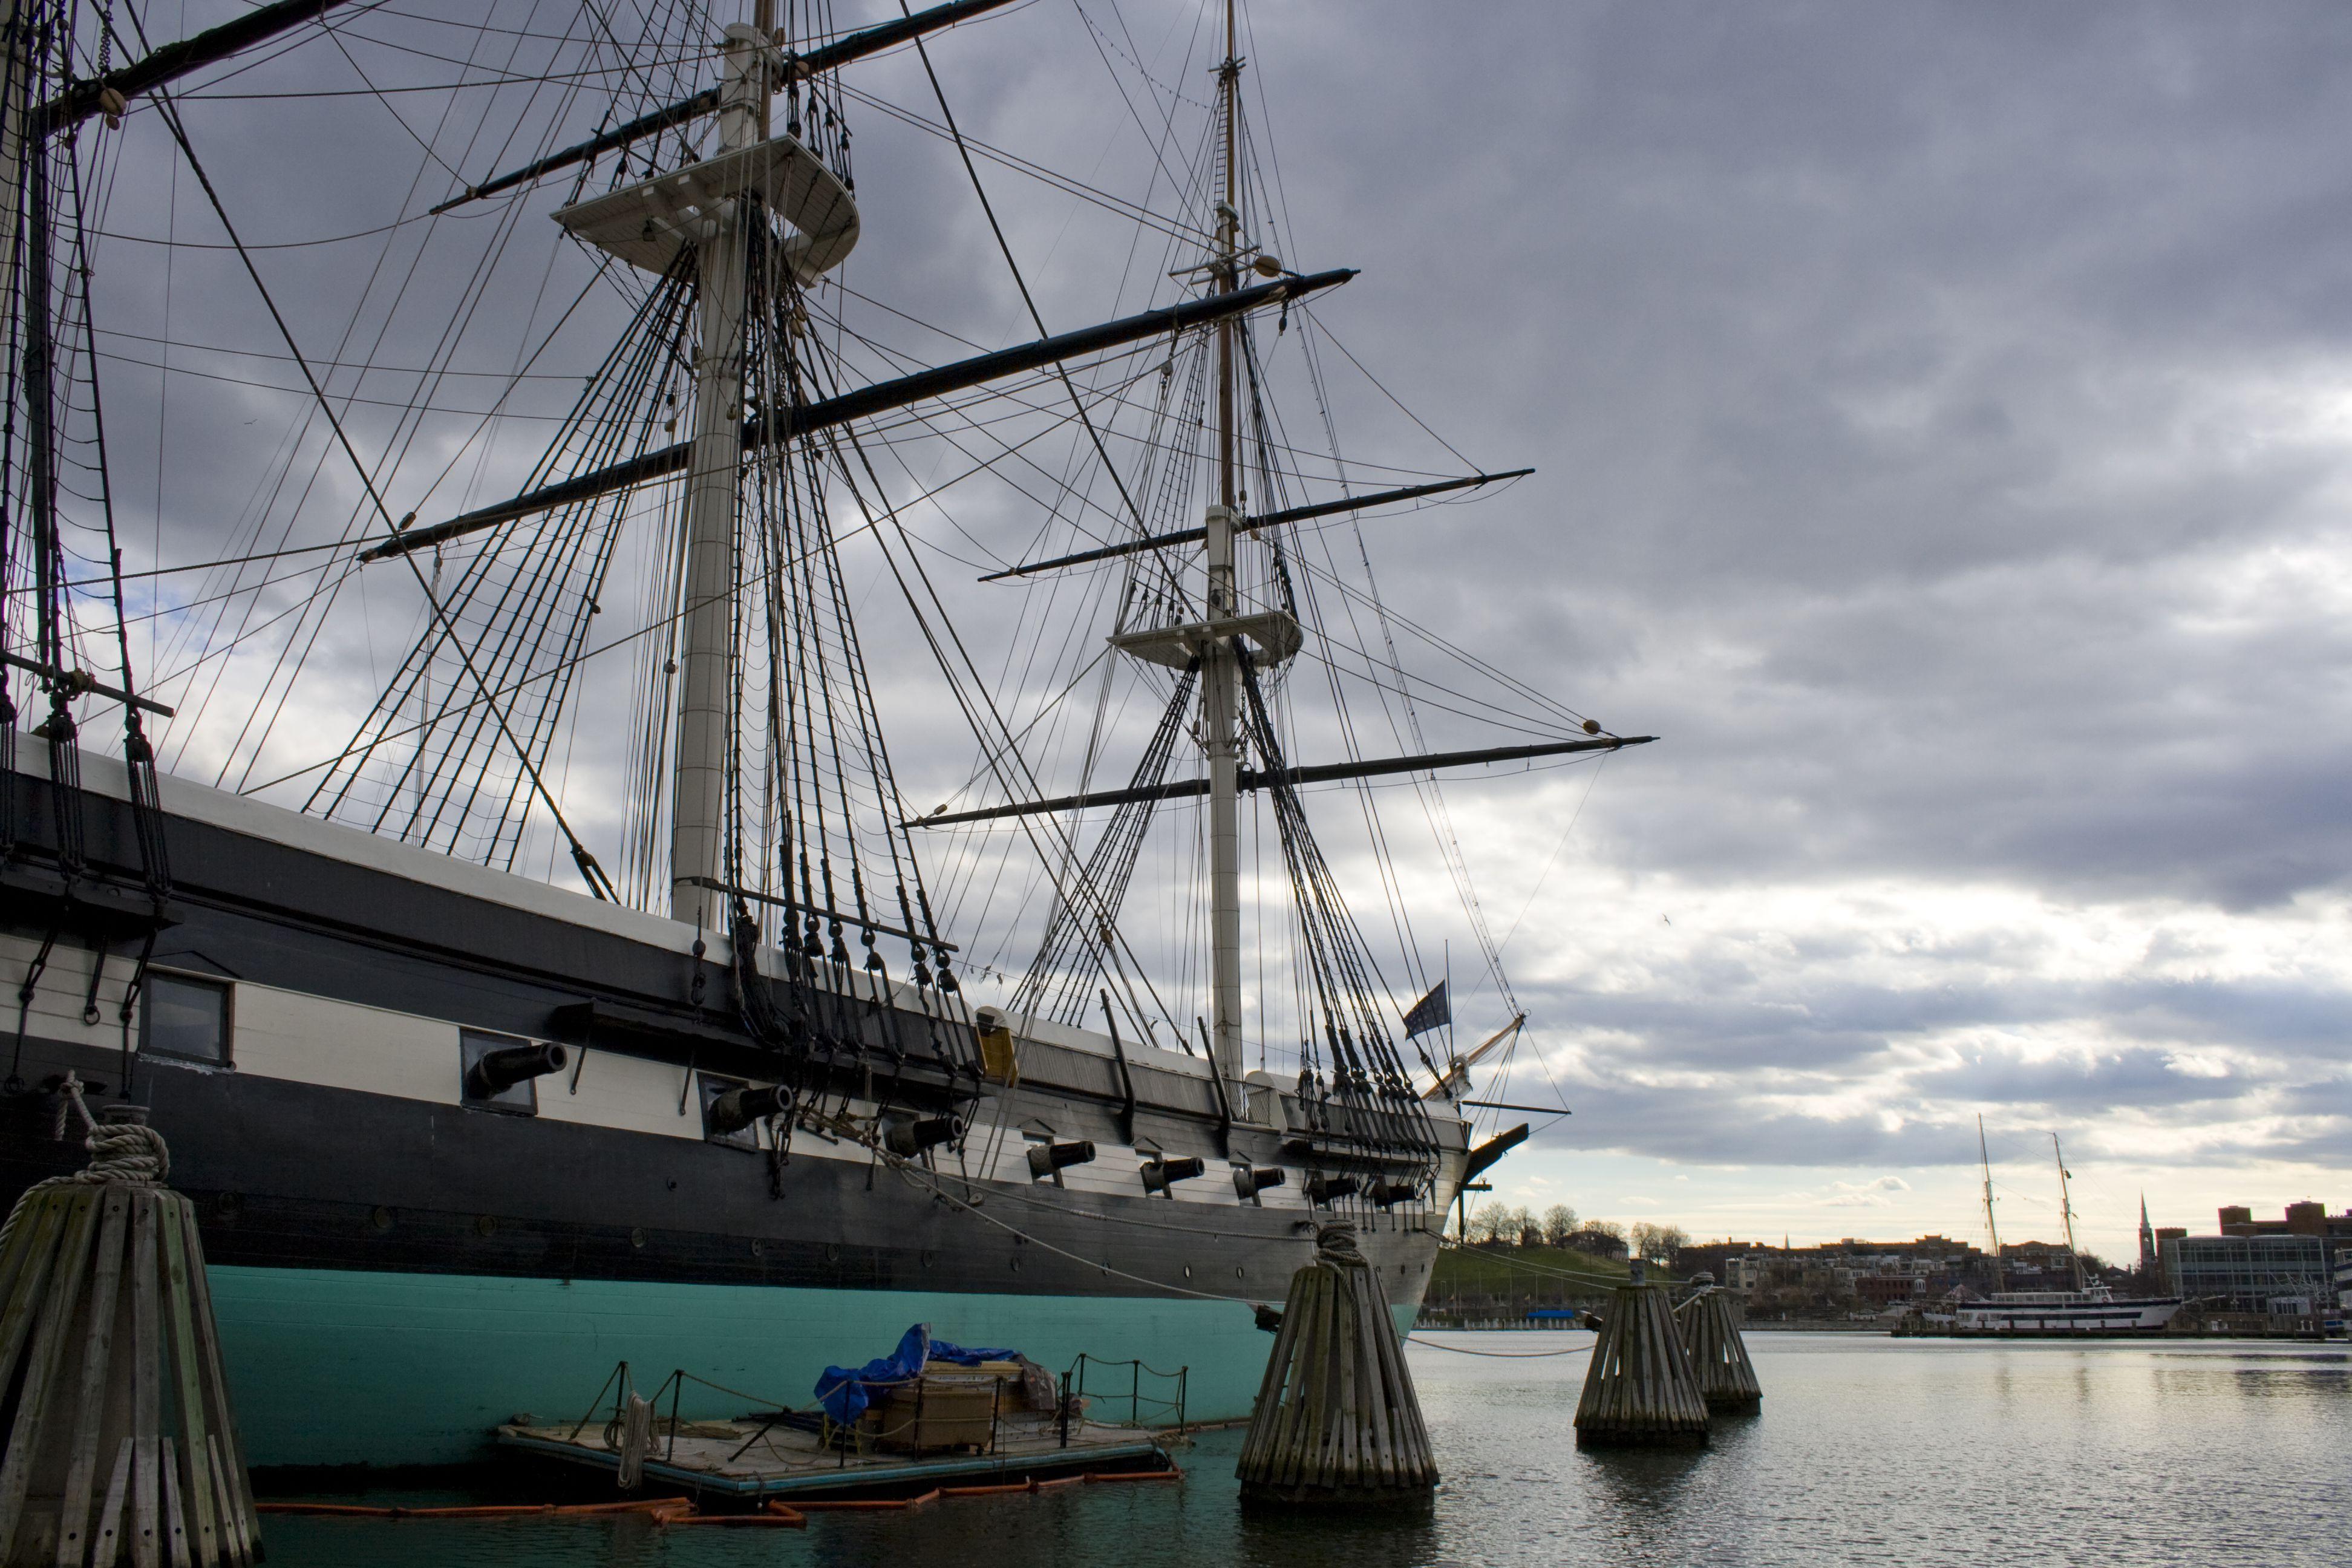 old sailing ship at Baltimore's inner harbor